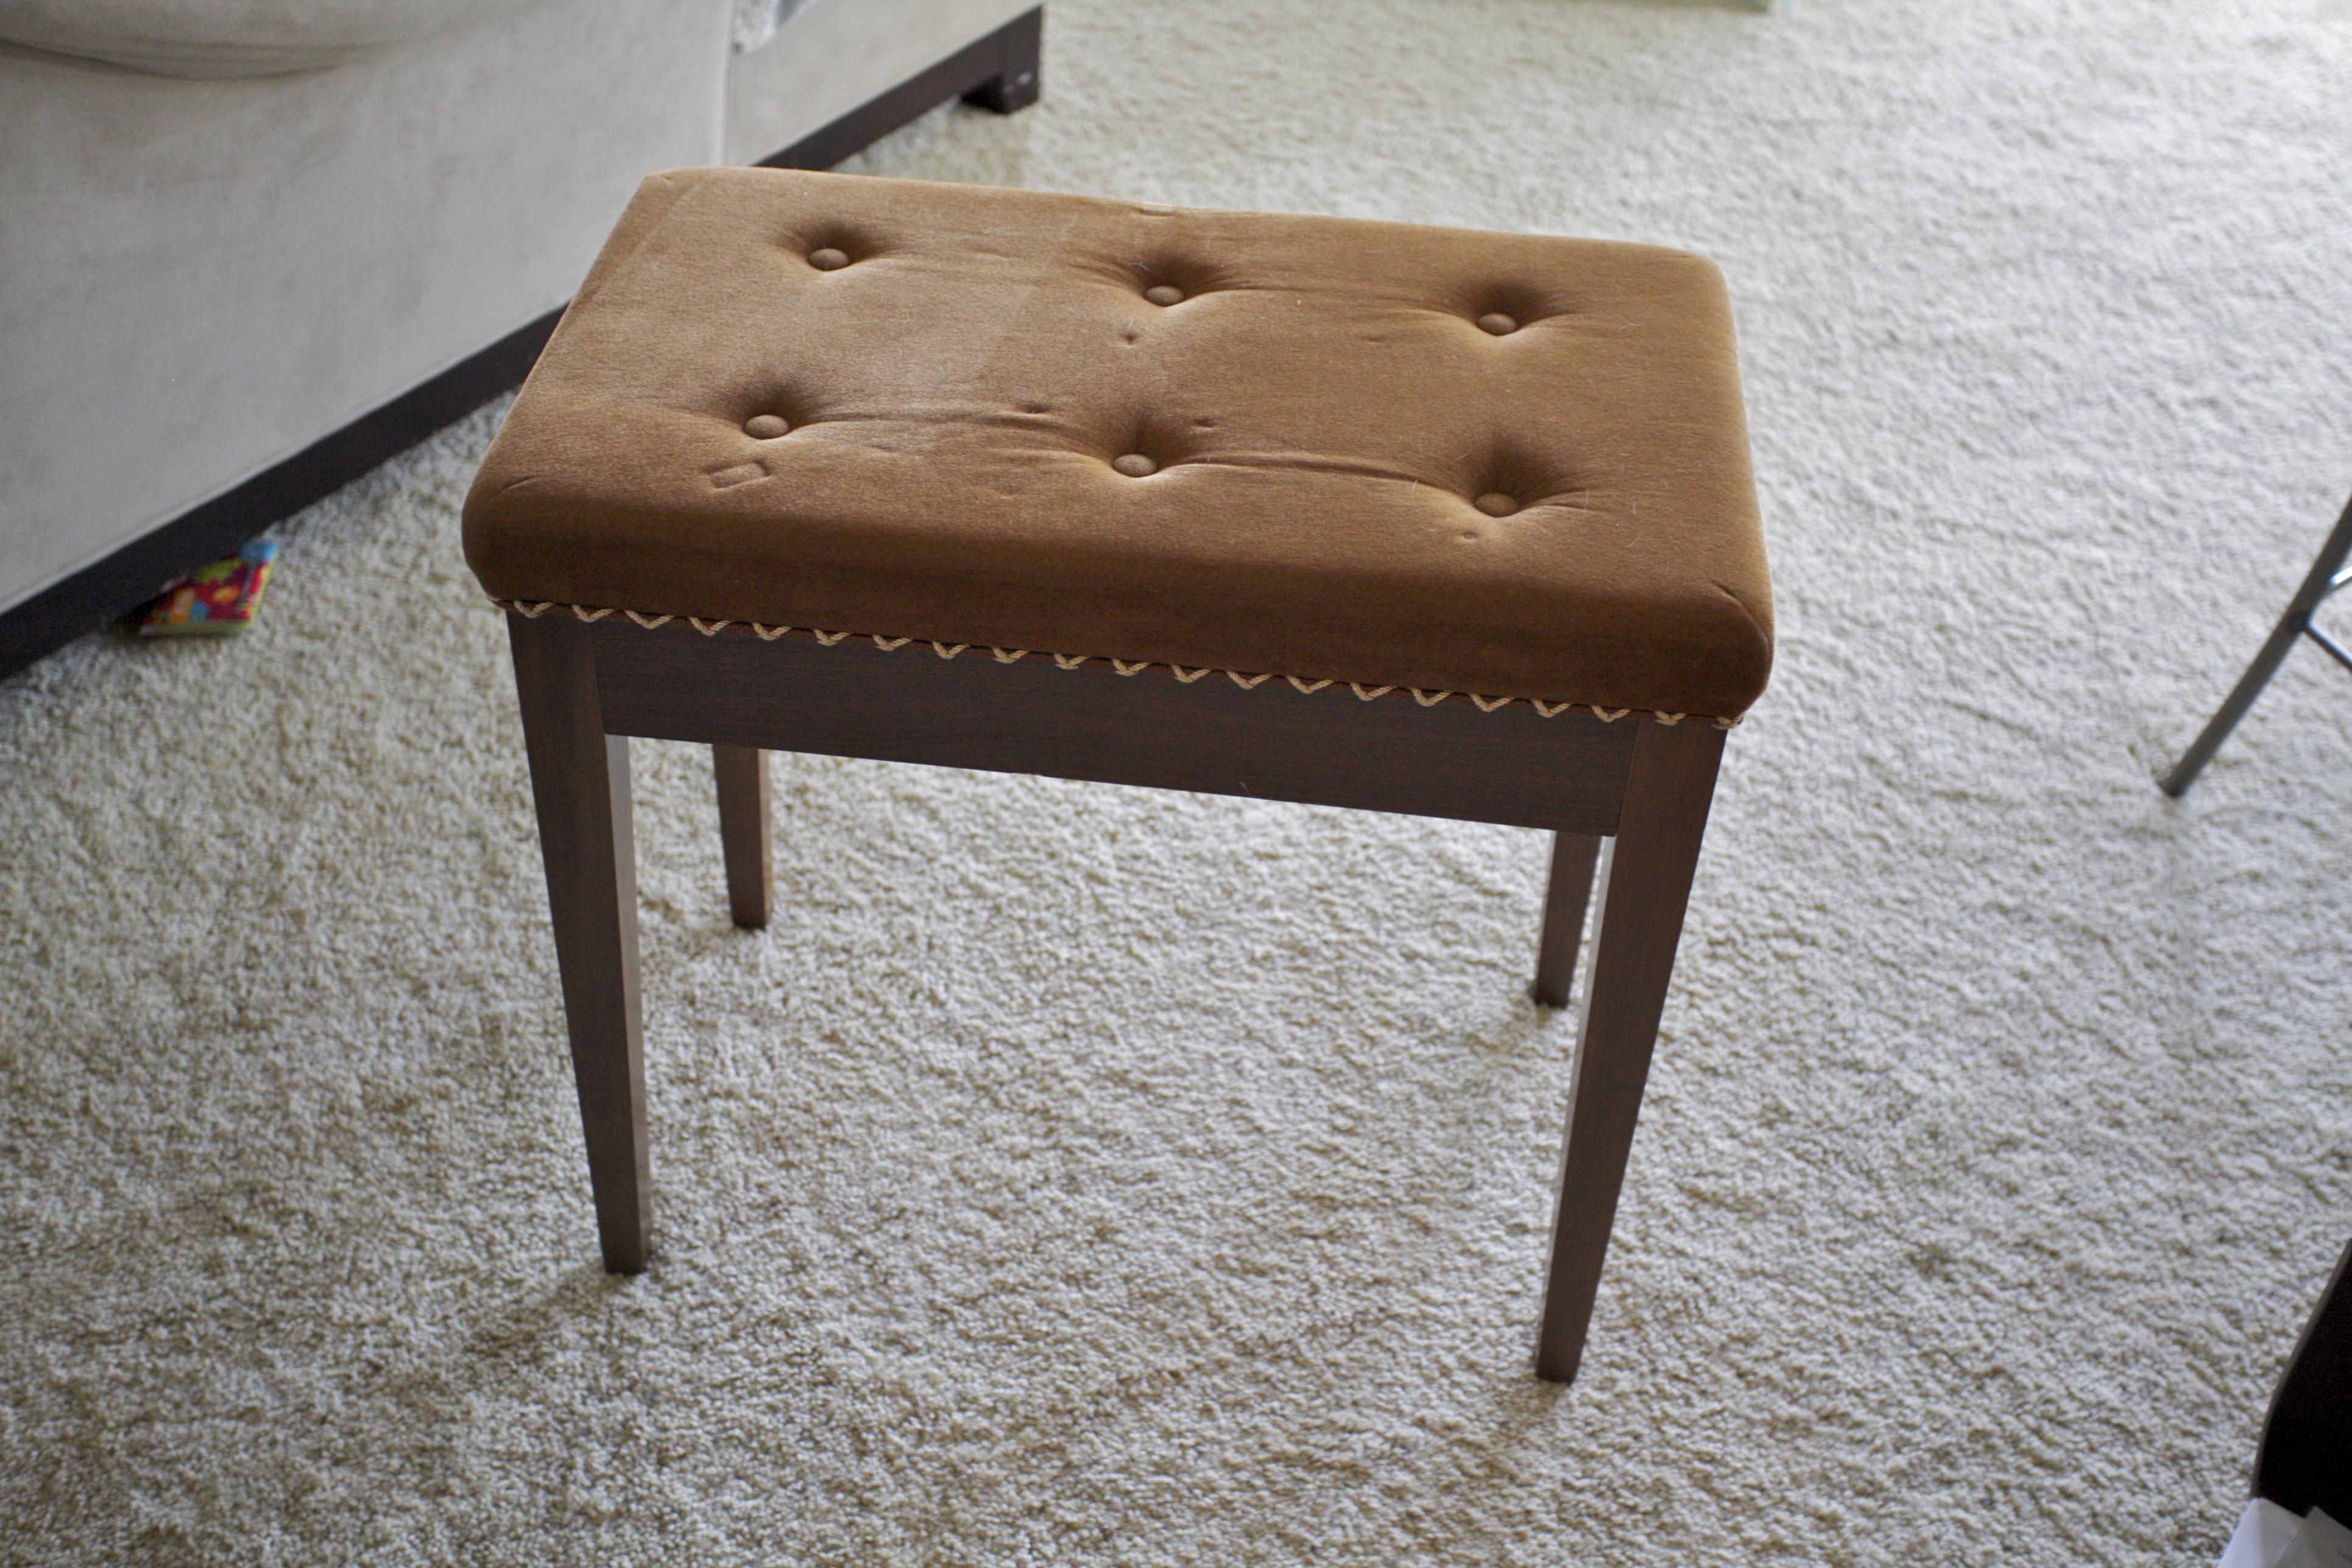 Here ... & DIY Reupholstery Bench | Rad Design islam-shia.org